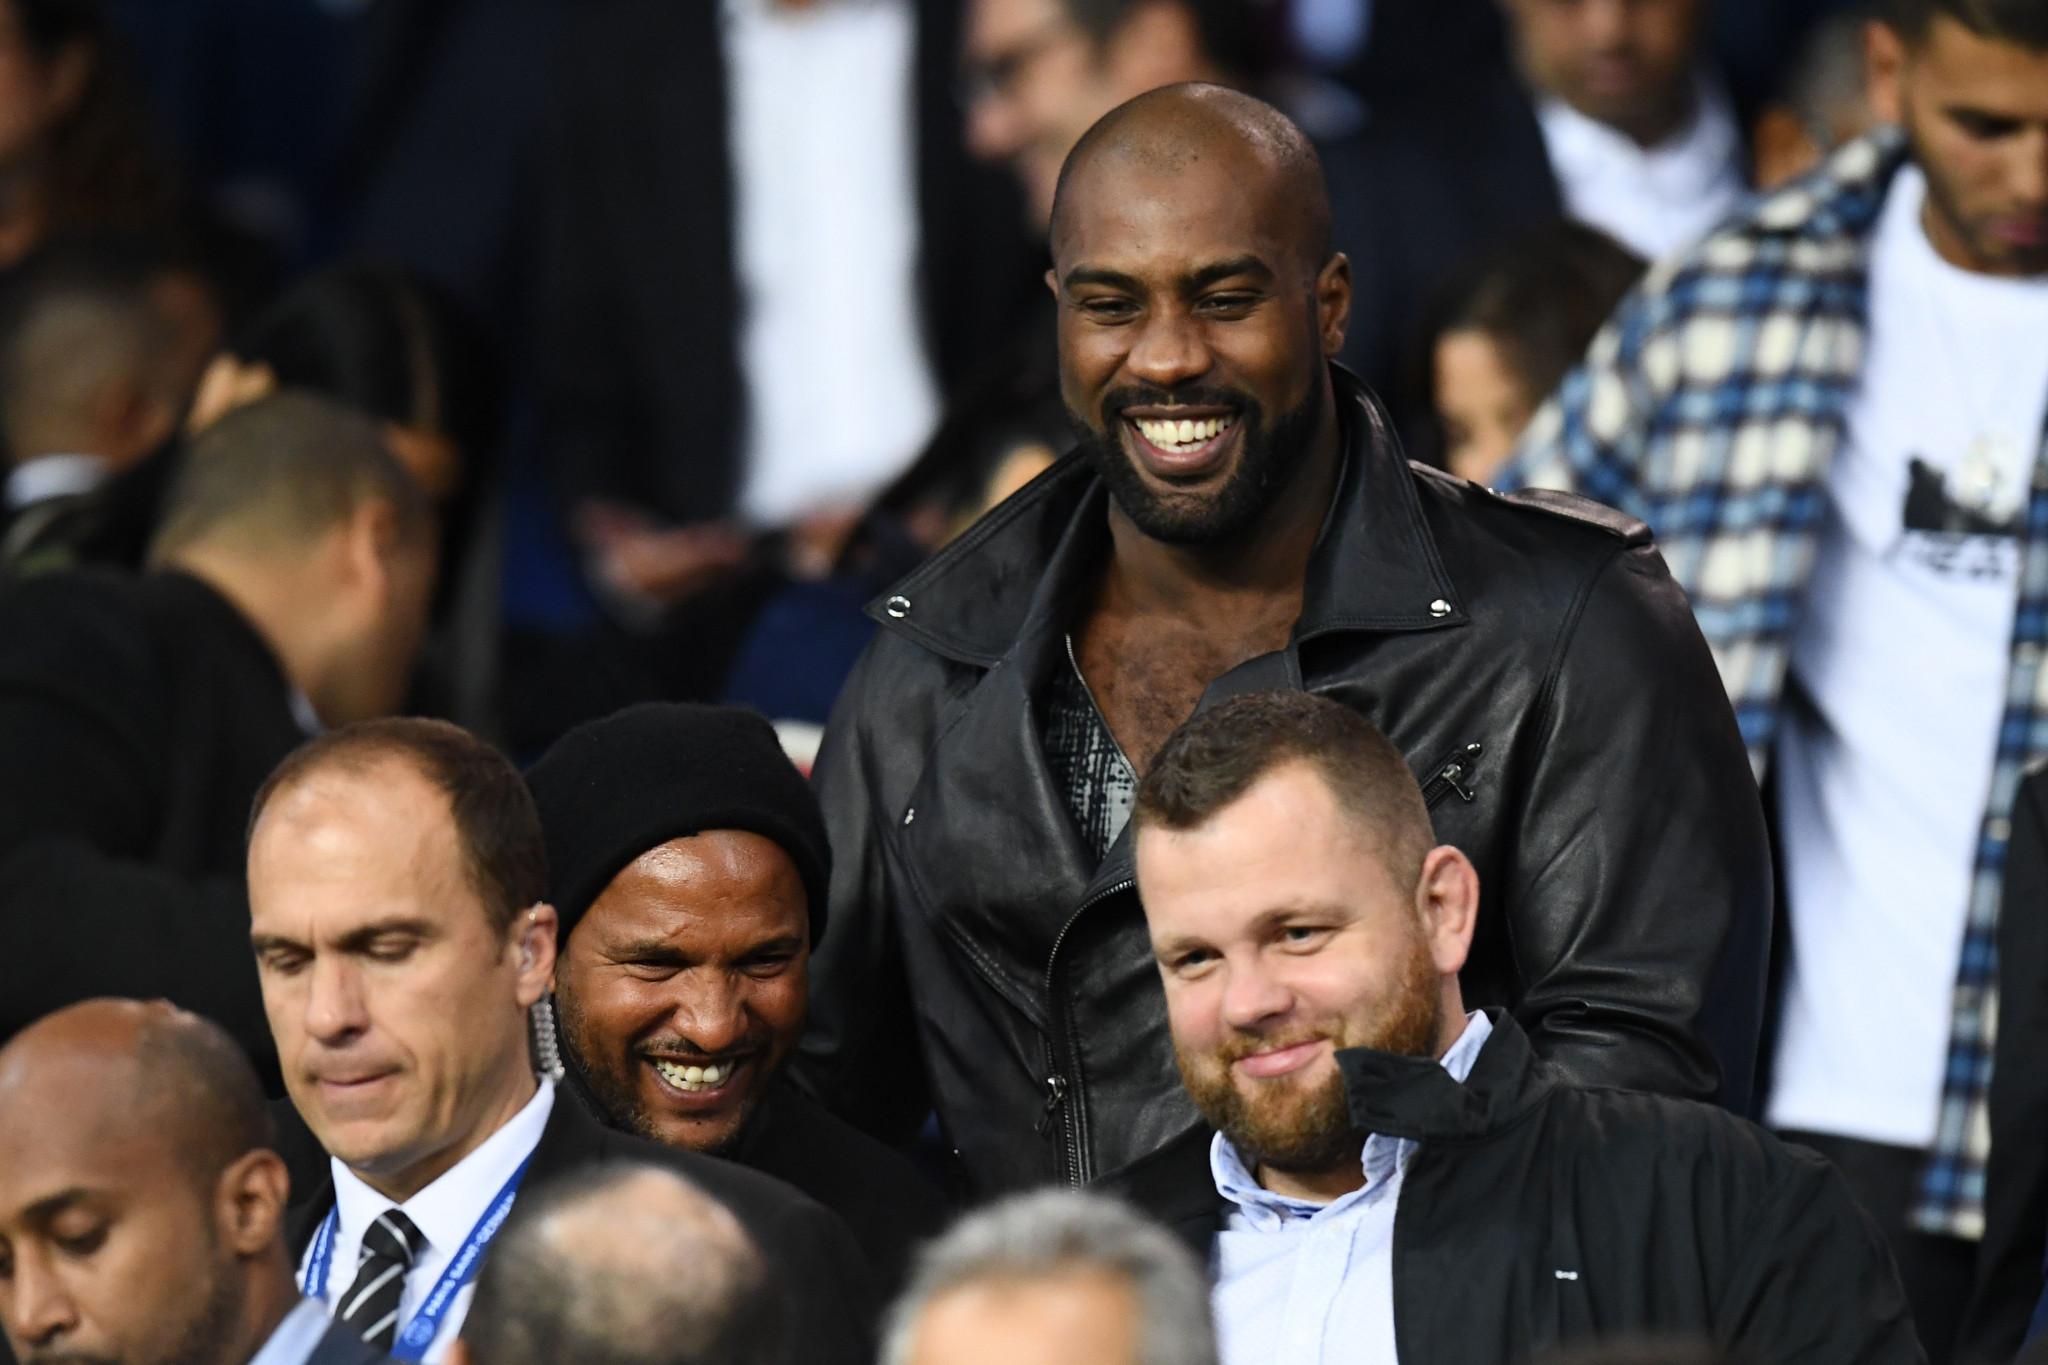 Riner signs five-year deal to relaunch judo team at Paris Saint-Germain